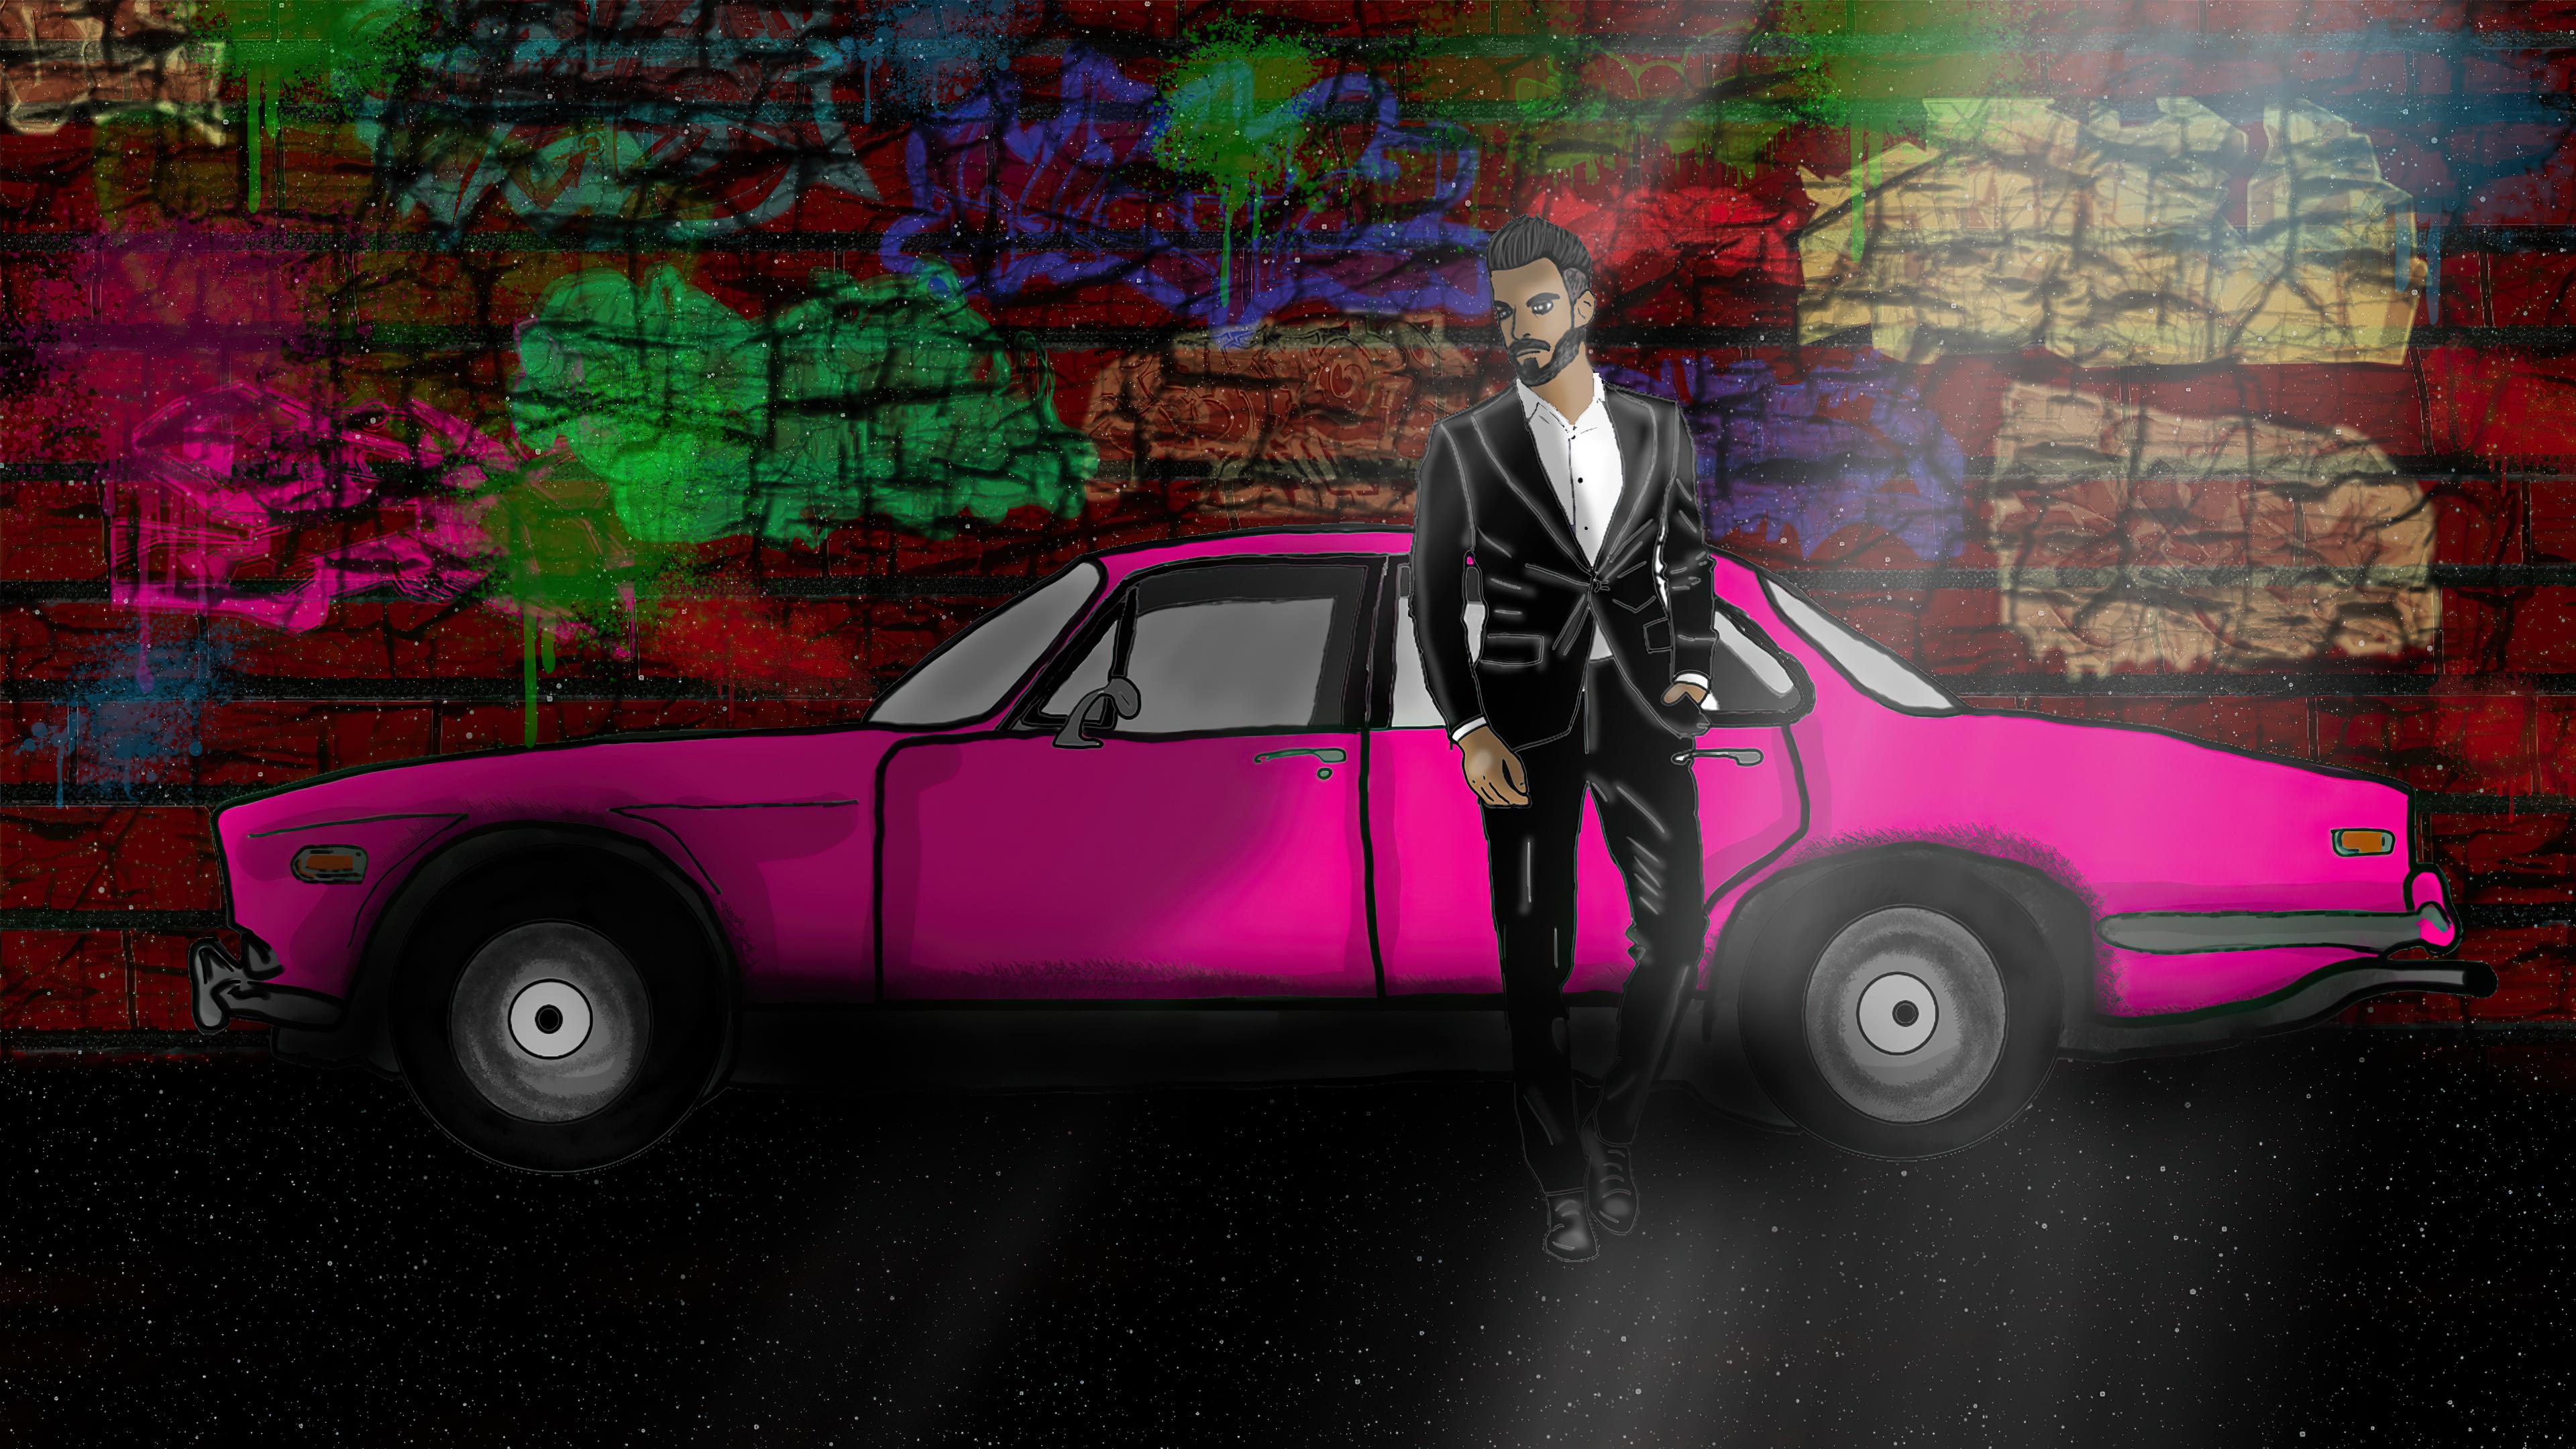 cool dude with pink car 4k 1634170486 - Cool Dude With Pink Car 4k - Cool Dude With Pink Car wallpapers, Cool Dude With Pink Car 4k wallpapers